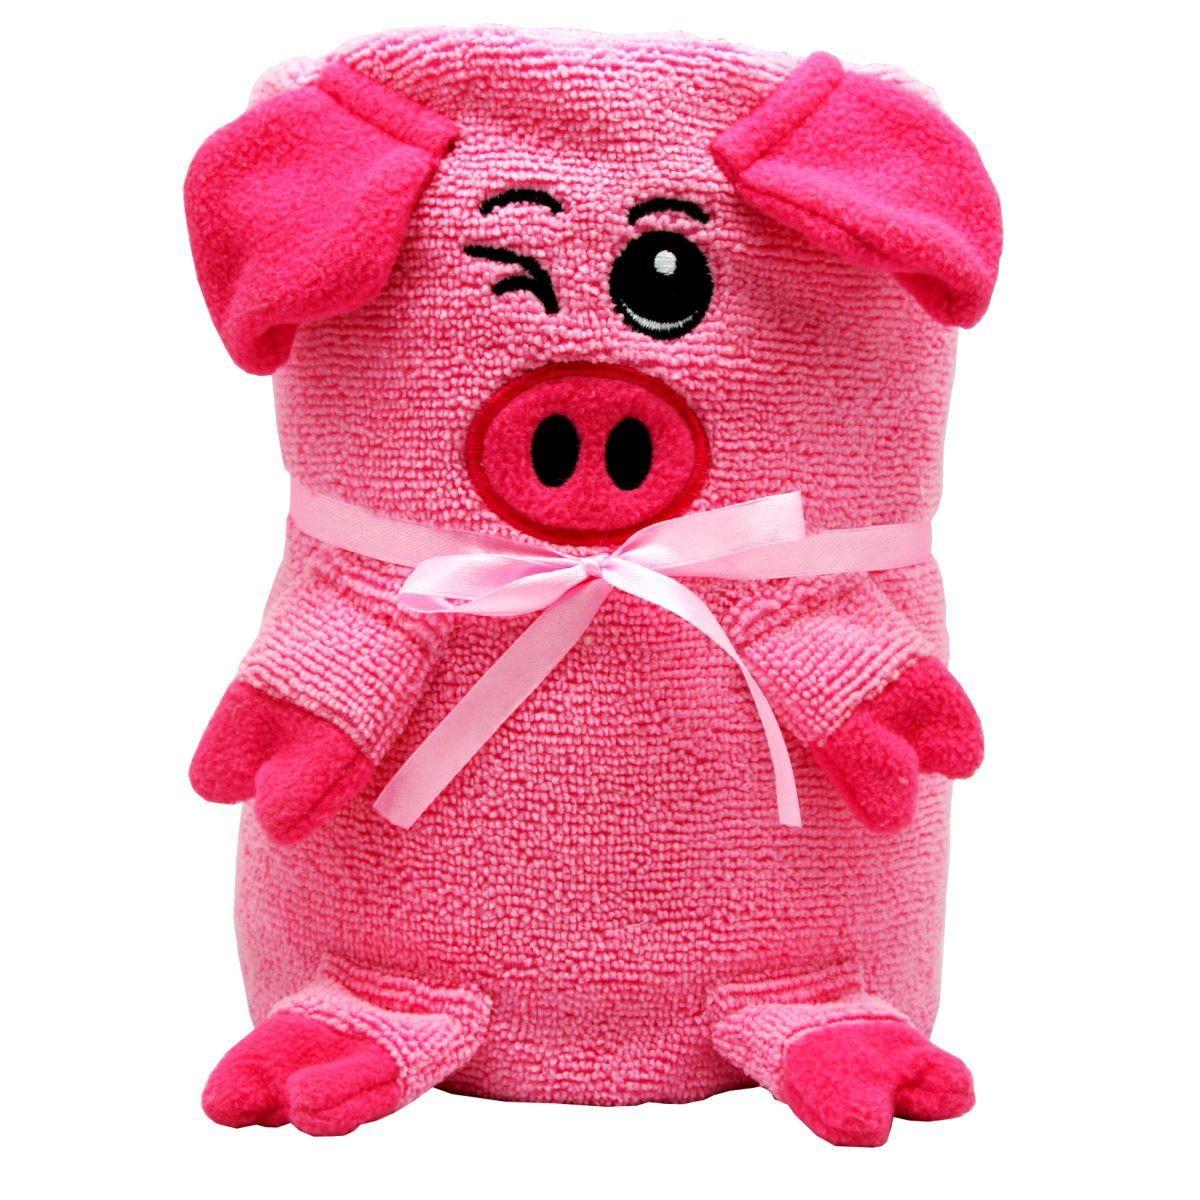 Мягкая игрушка-полотенце Розовая Свинка, 130 x180 см